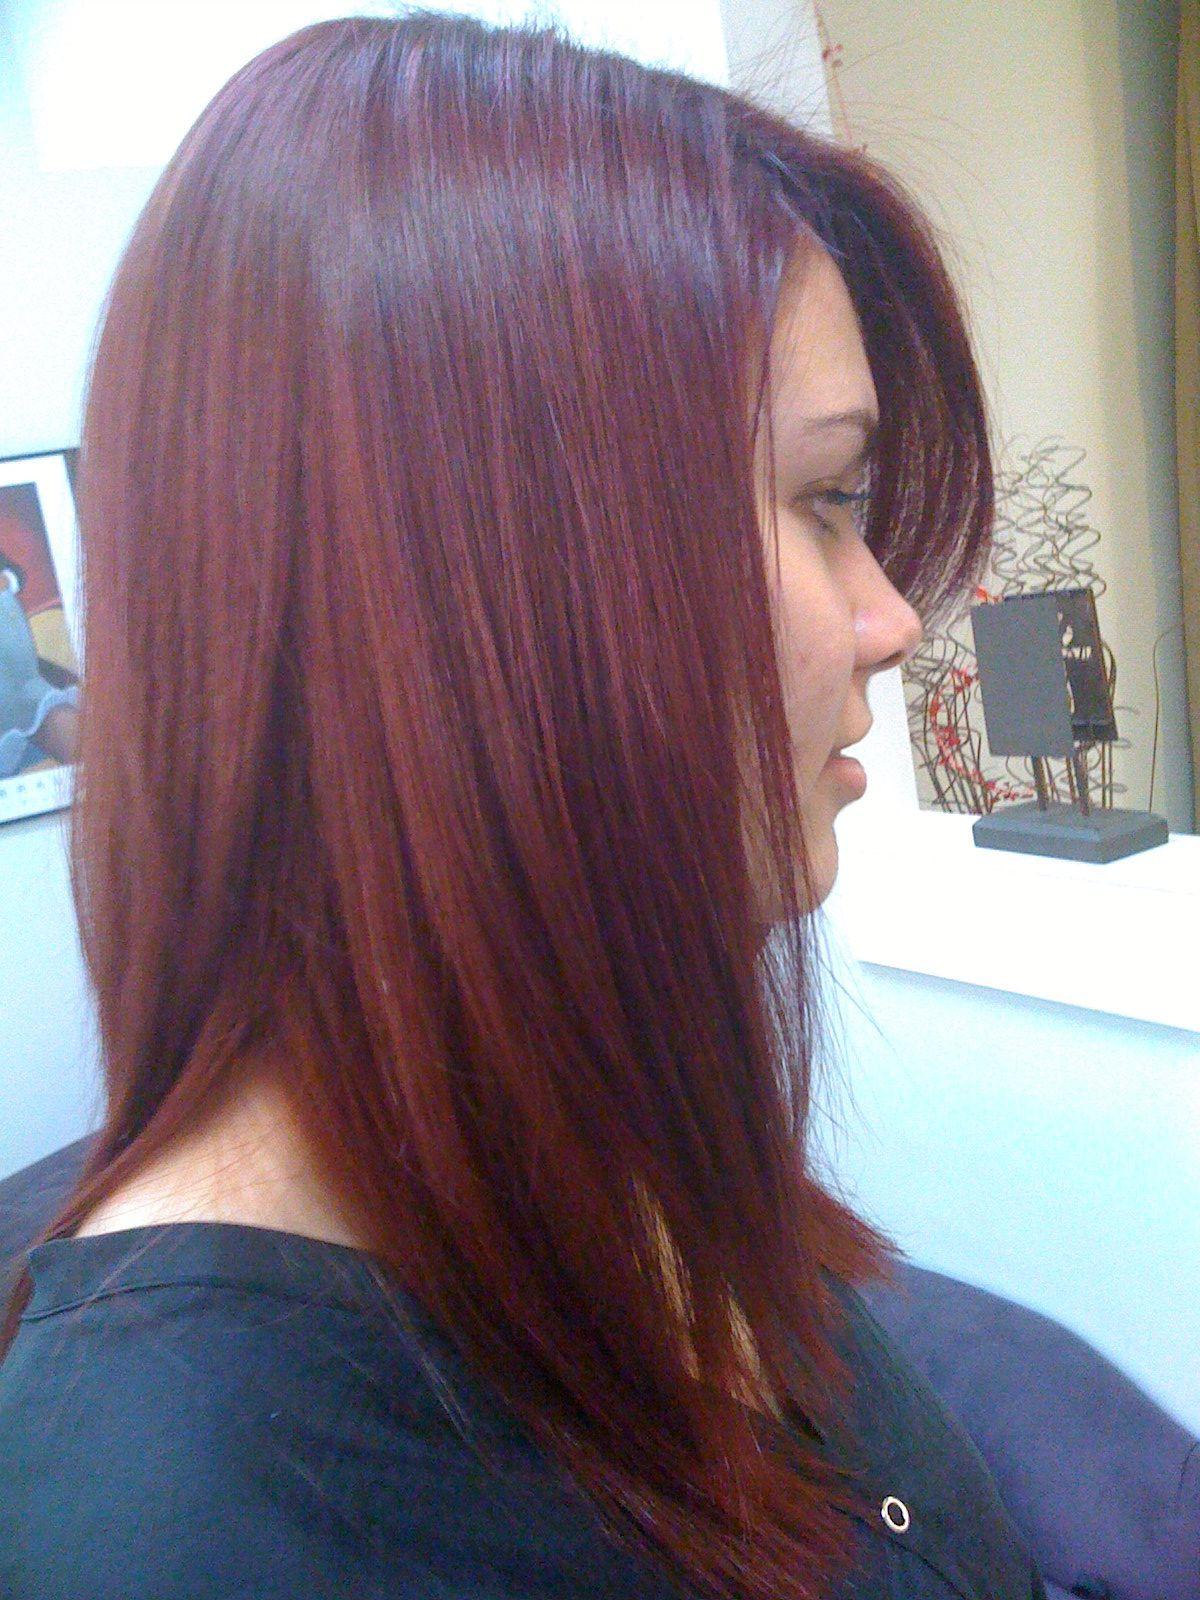 Merlot hair color - Wine merlot hair color